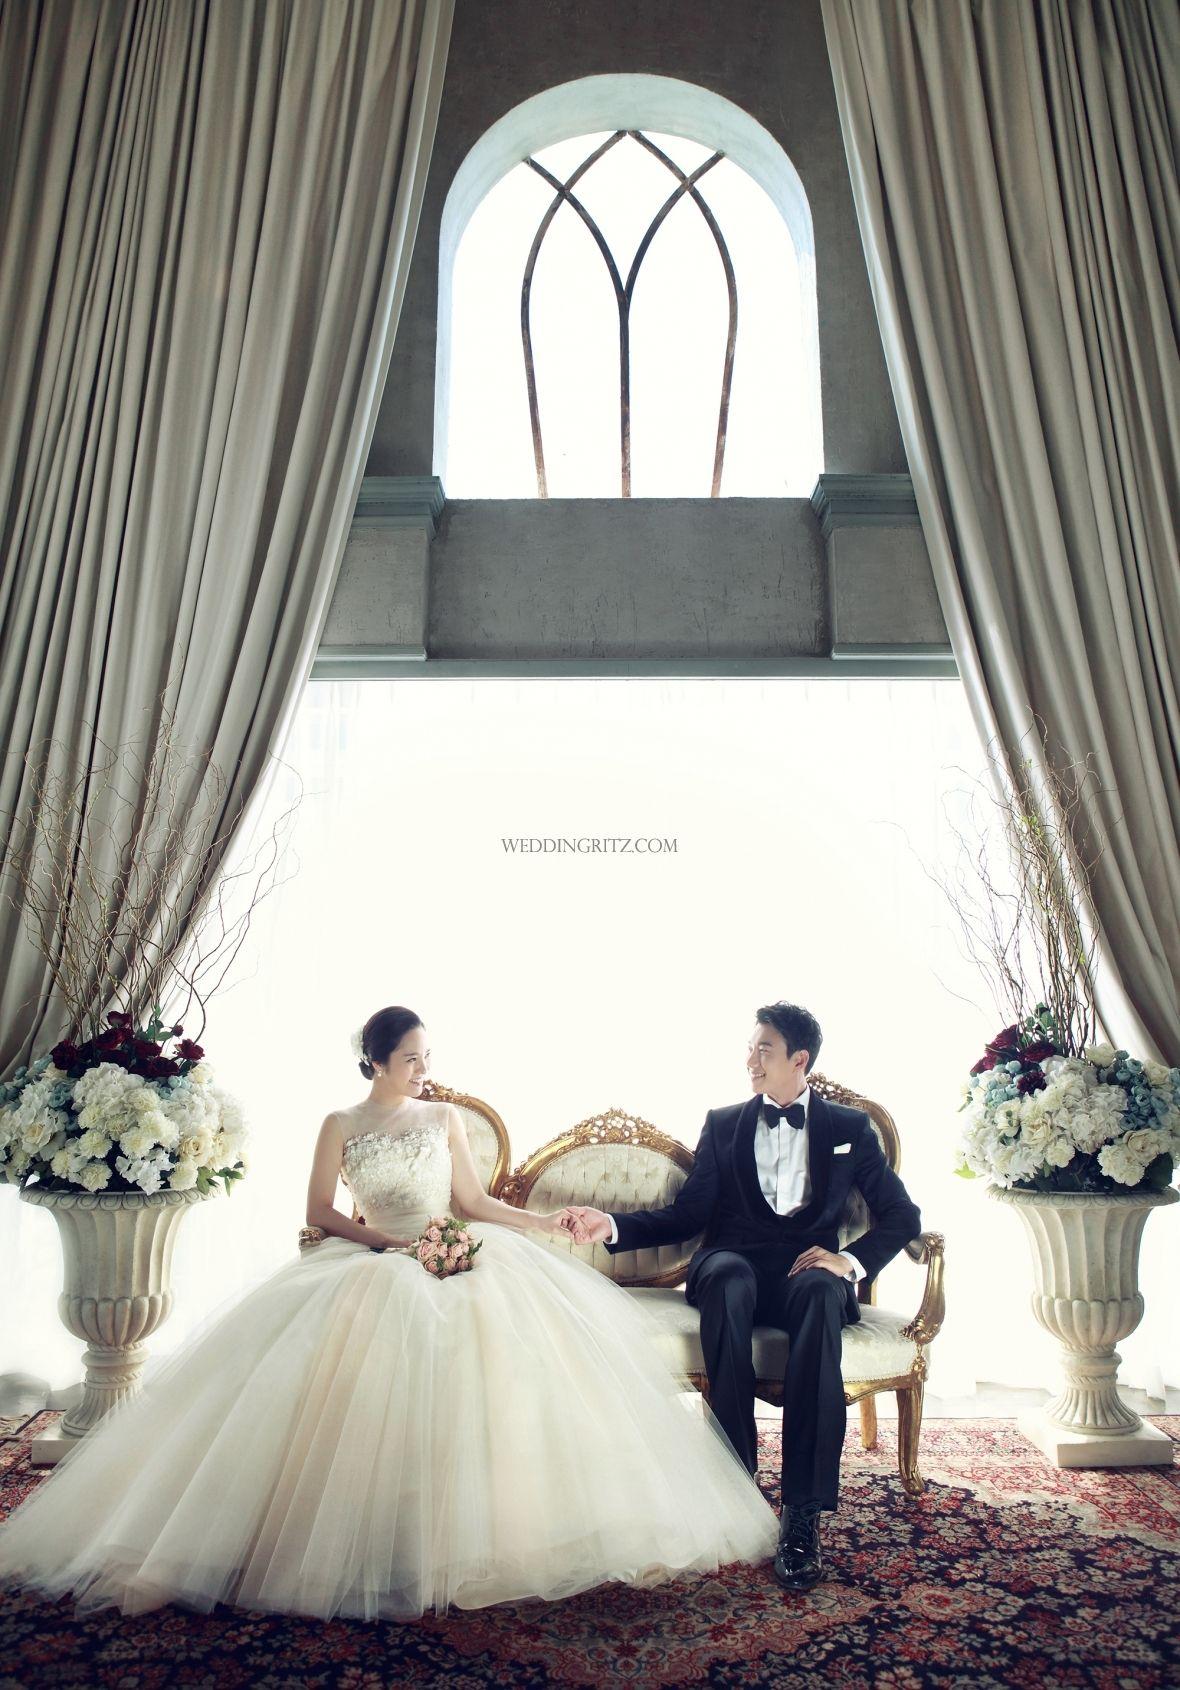 Korea pre wedding, Korea pre wedding photo shoot, Korea wedding, Korea pre wedding photo, wedding, pre wedding